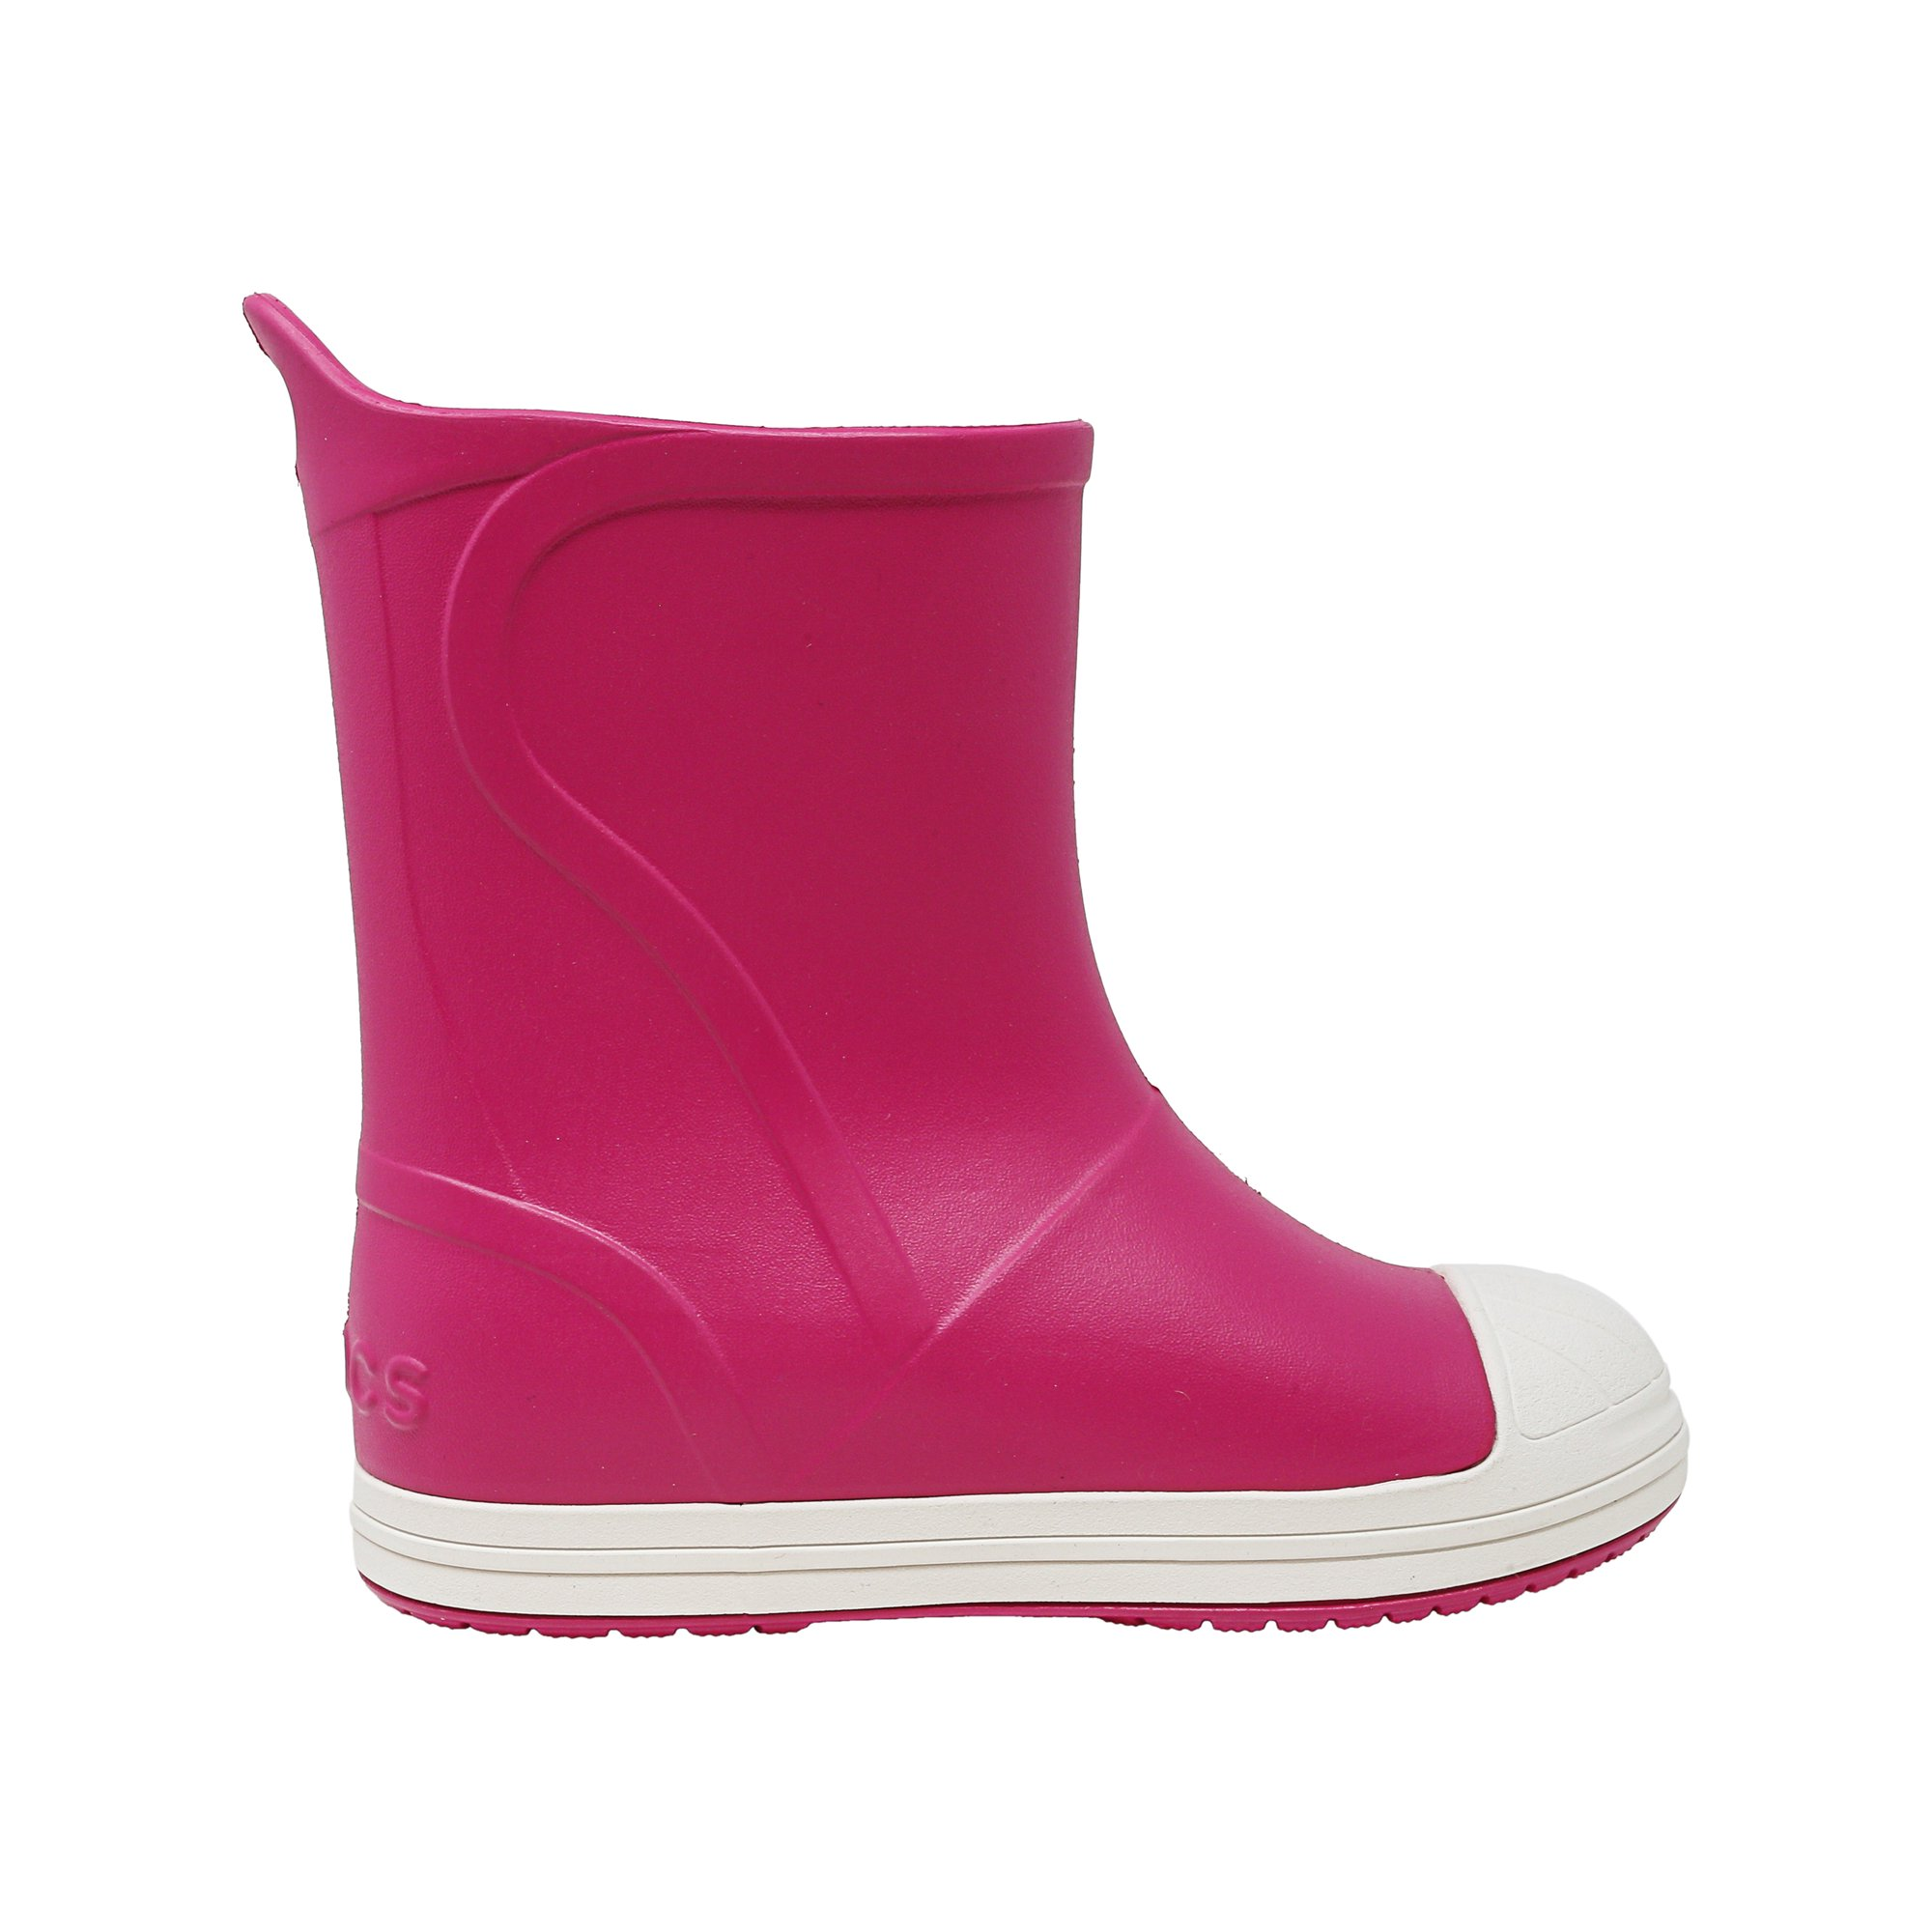 feb282656 Buy Crocs Bump It Boot Candy Pink - Oyster Mid-Calf Rain - 13M ...